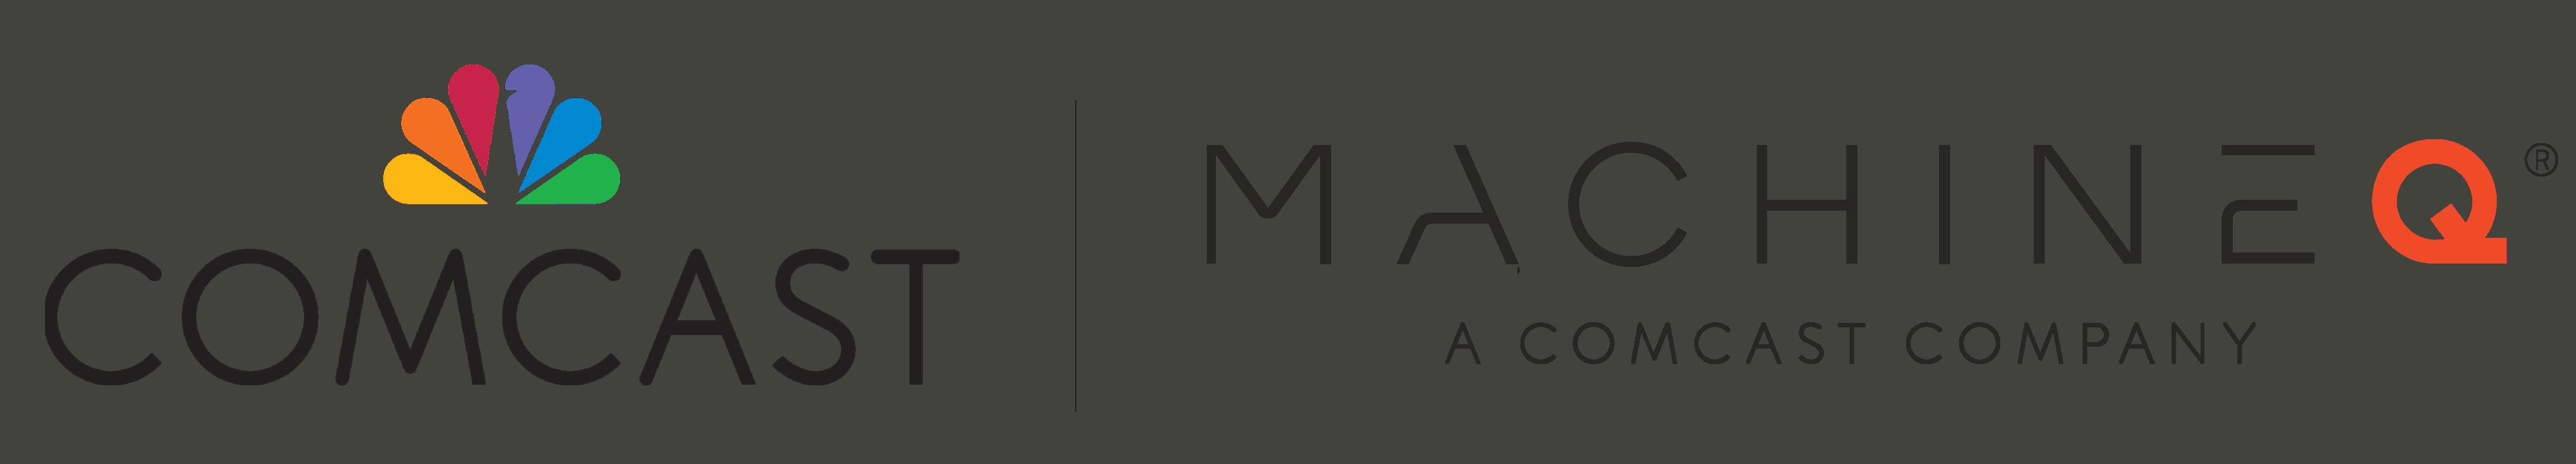 Comcast MQ Logo Lock up